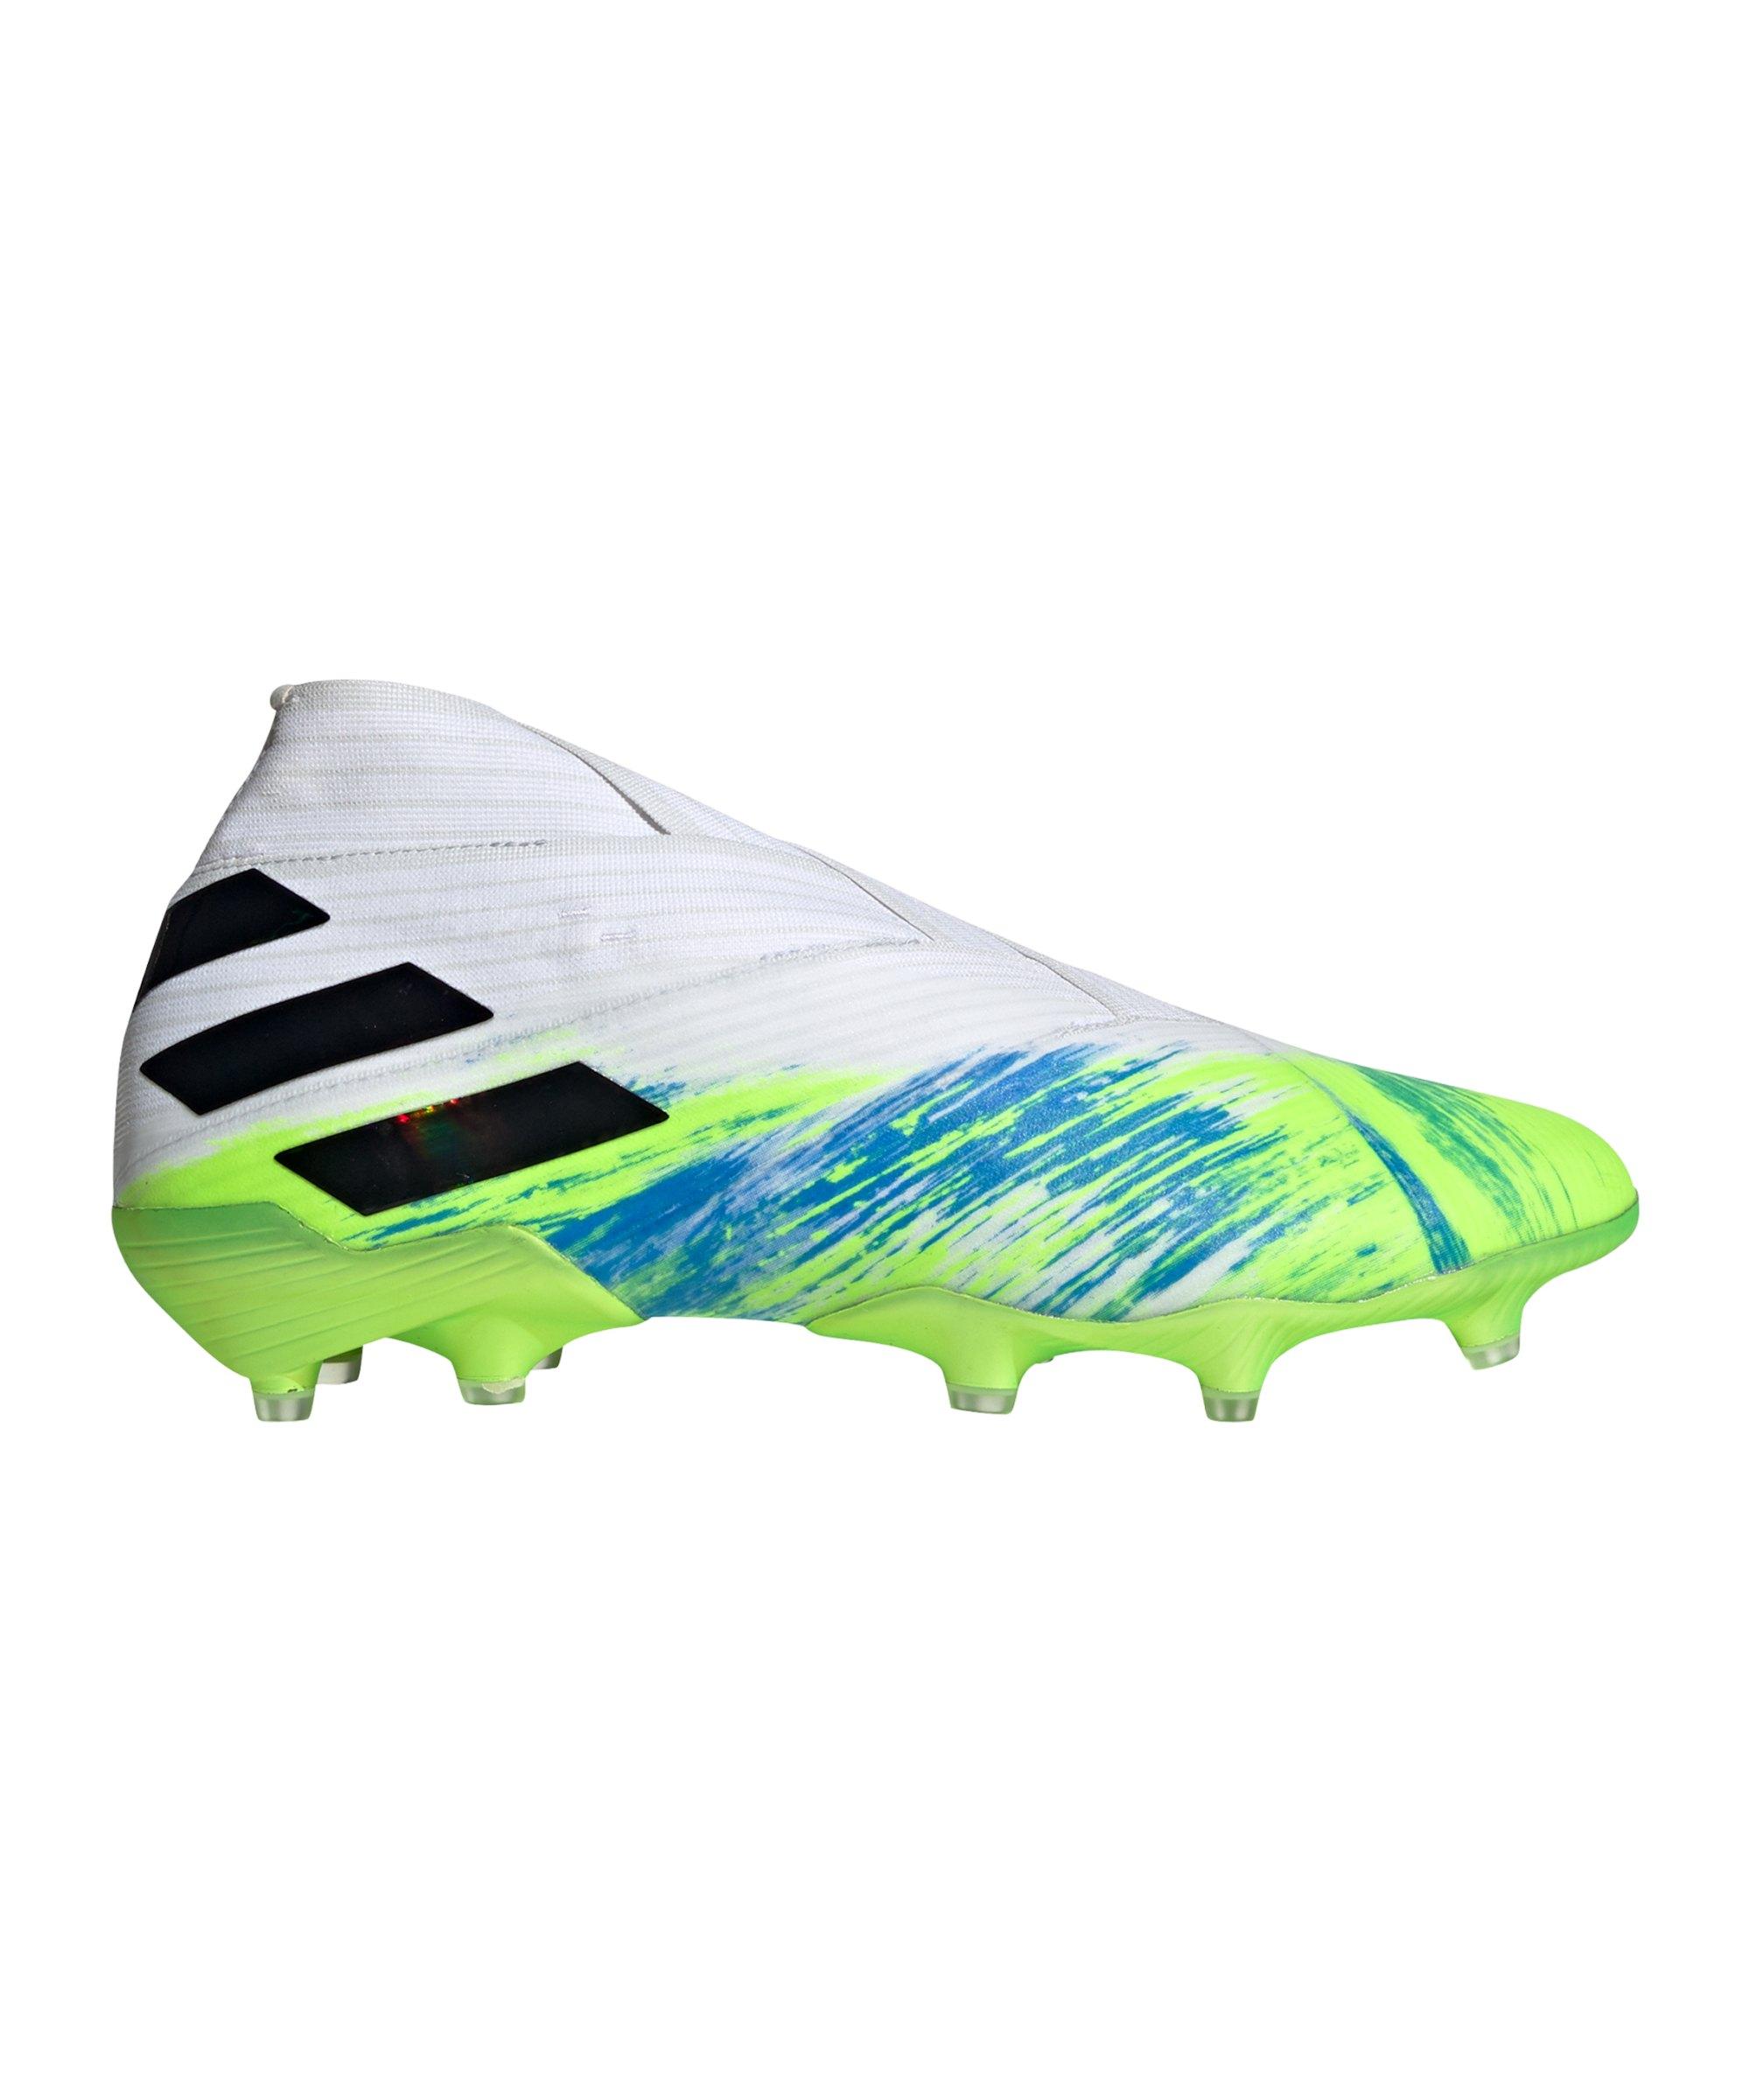 Adidas NEMEZIZ Uniforia 19+ FG Weiss Grün